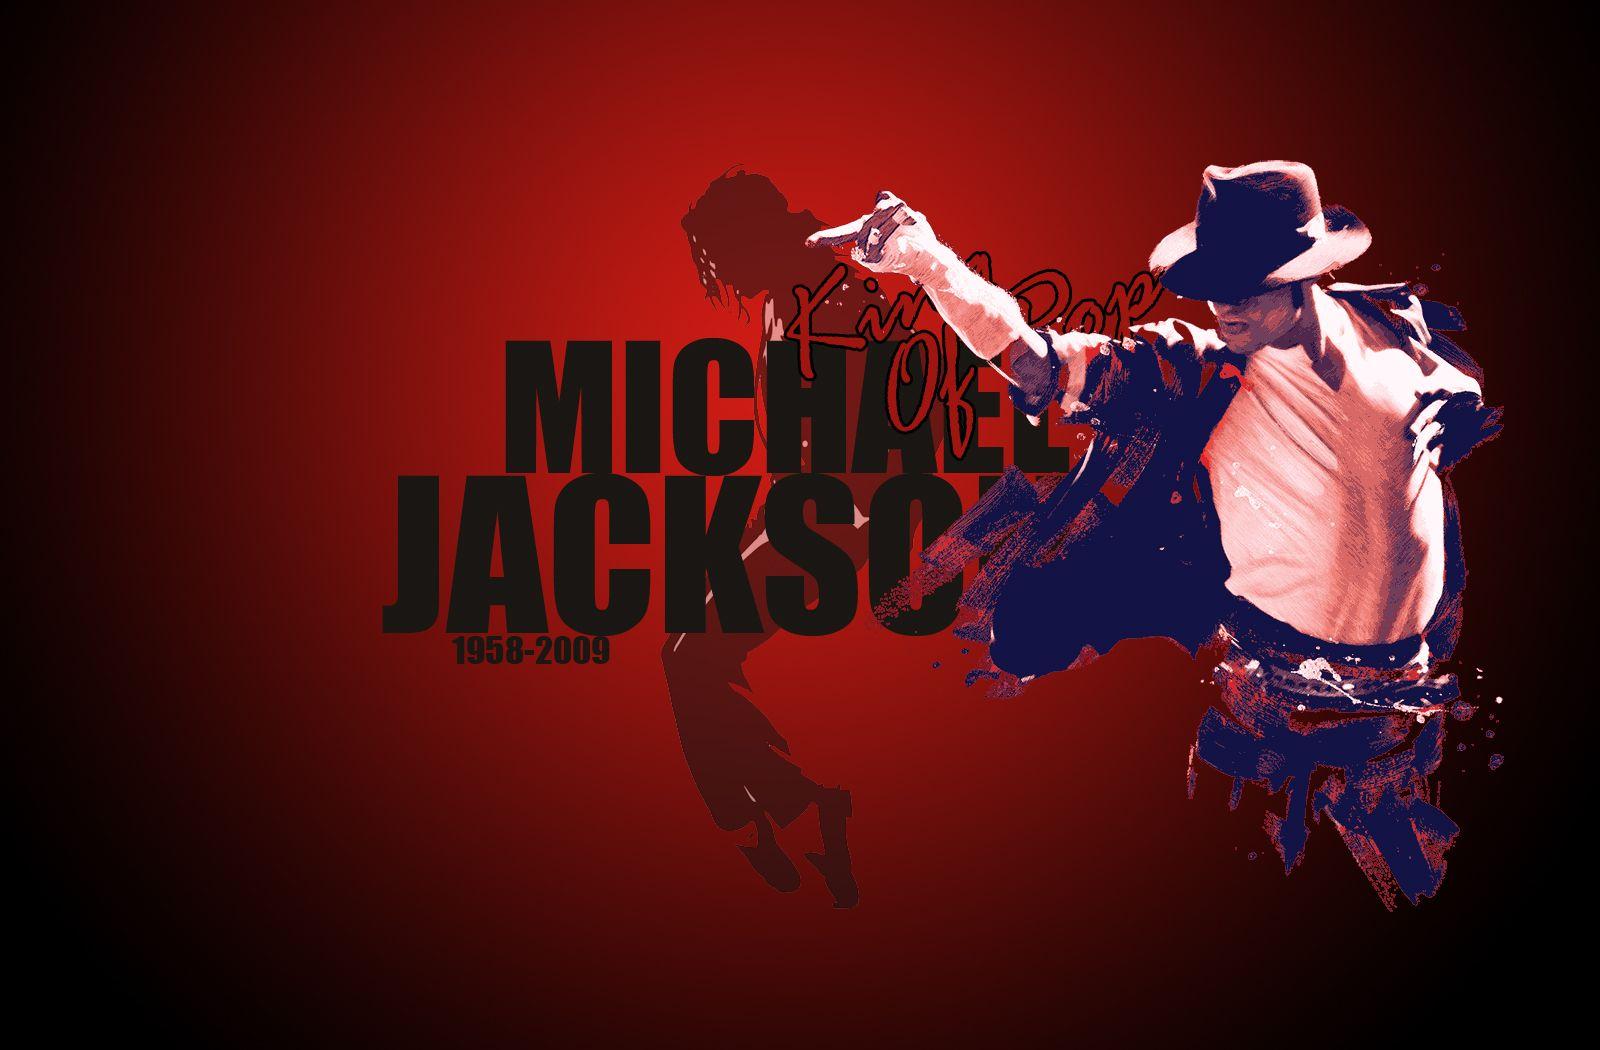 Michael Jackson Michael Jackson Images Michael Jackson Wallpaper Michael Jackson Dance